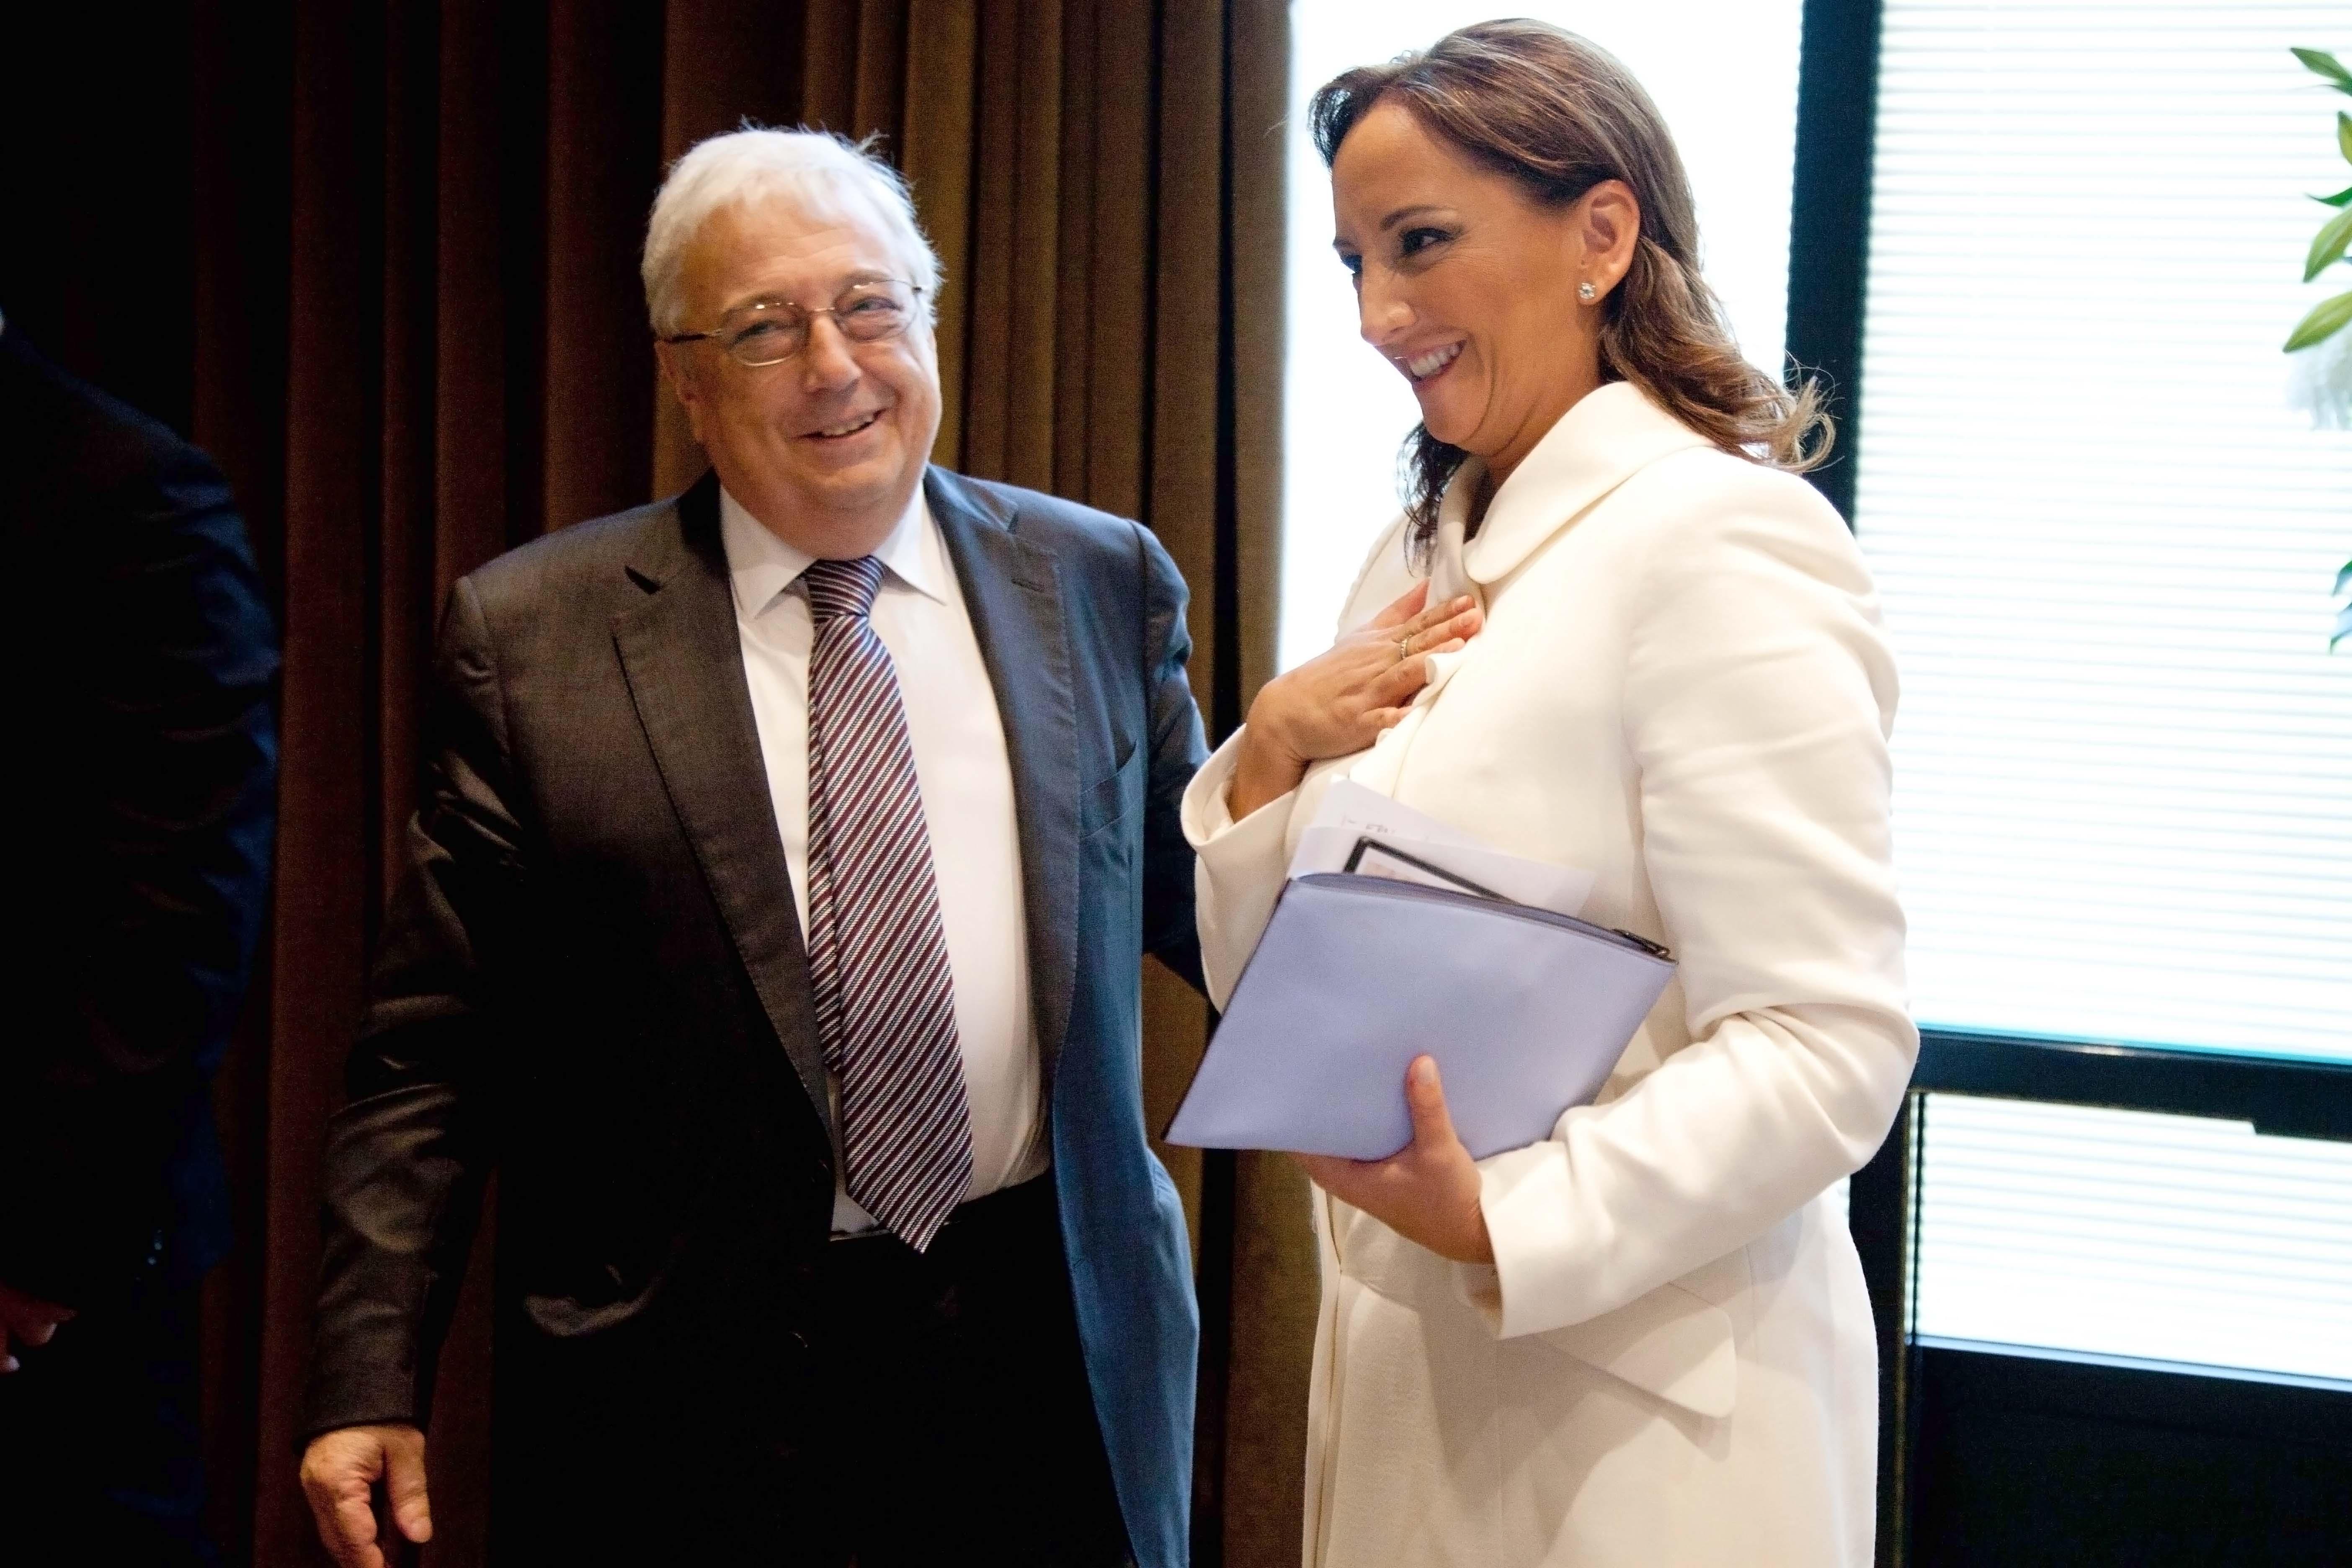 La Secretaria de Turismo, Claudia Ruiz Massieu, durante la gira de trabajo por Portugal.